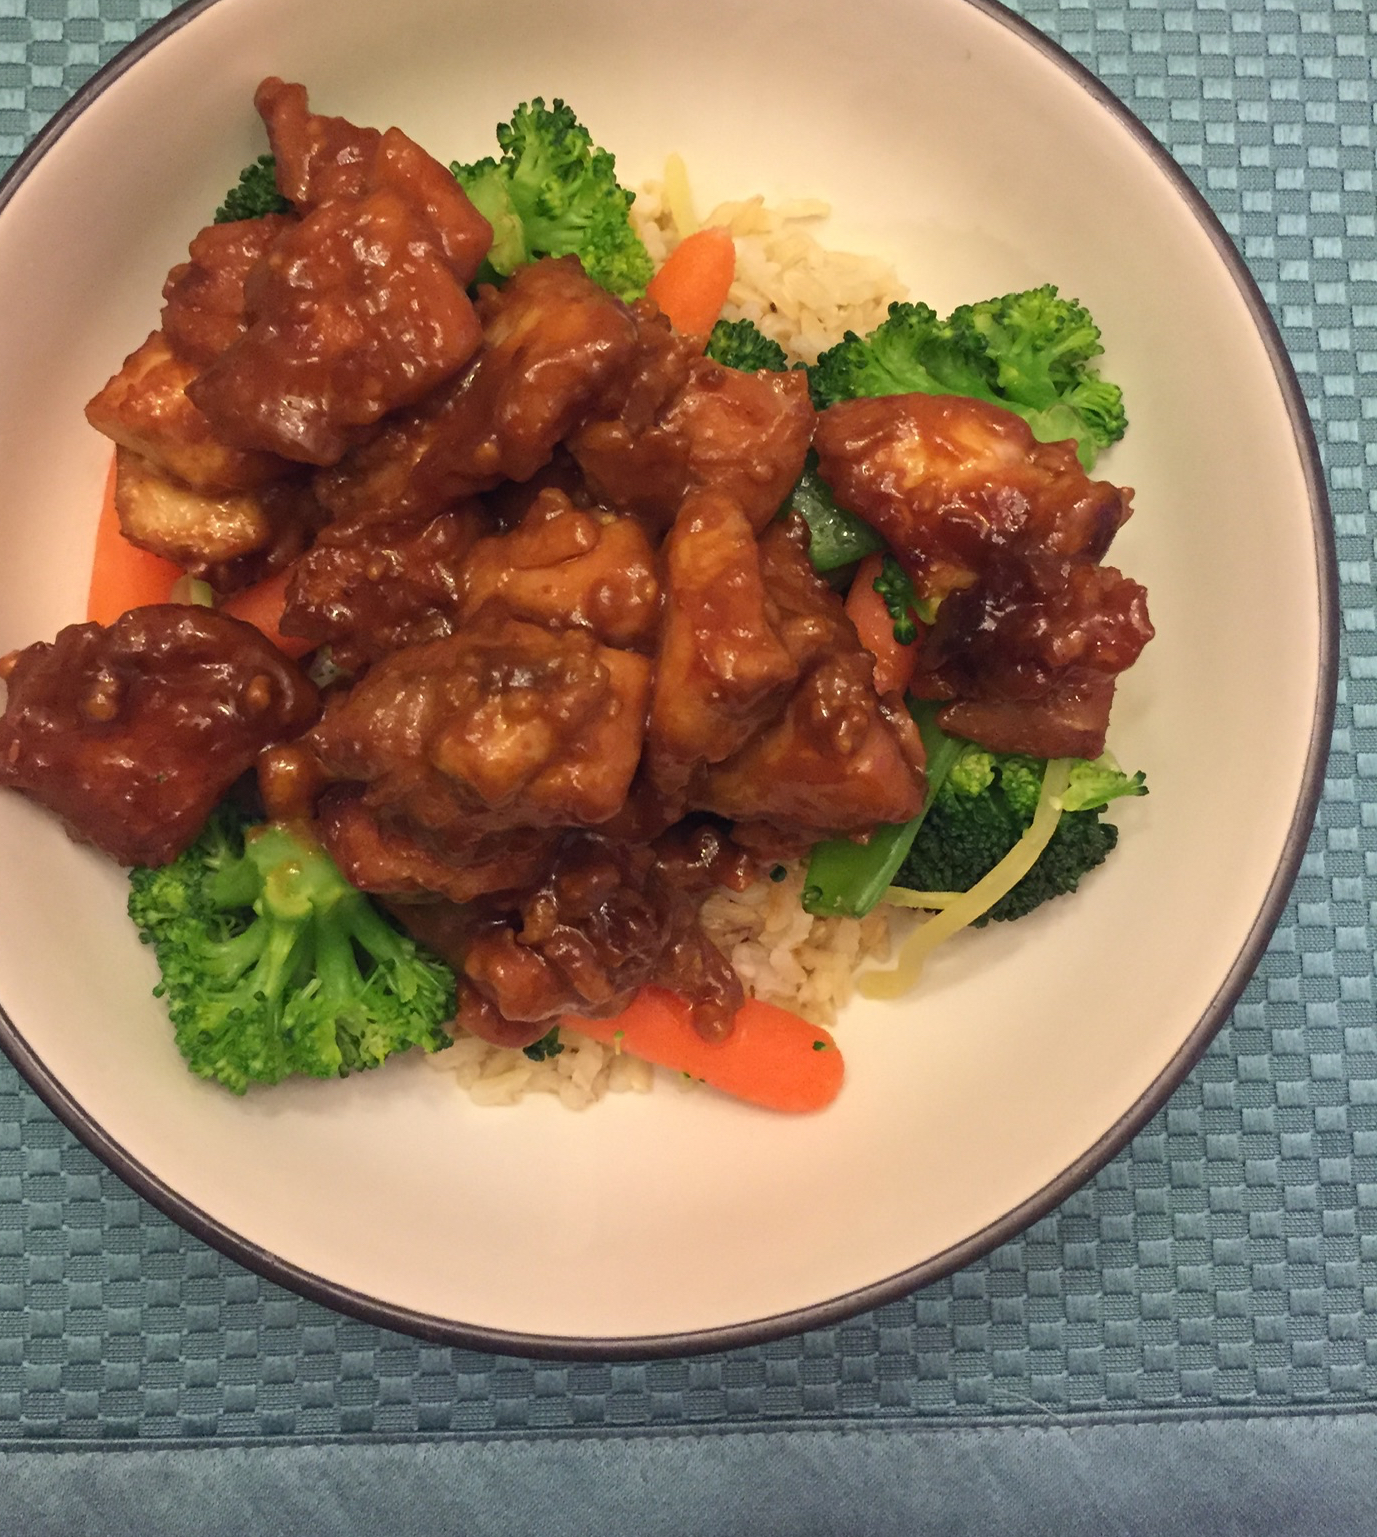 Thai Chicken Thigh Bake thom7833